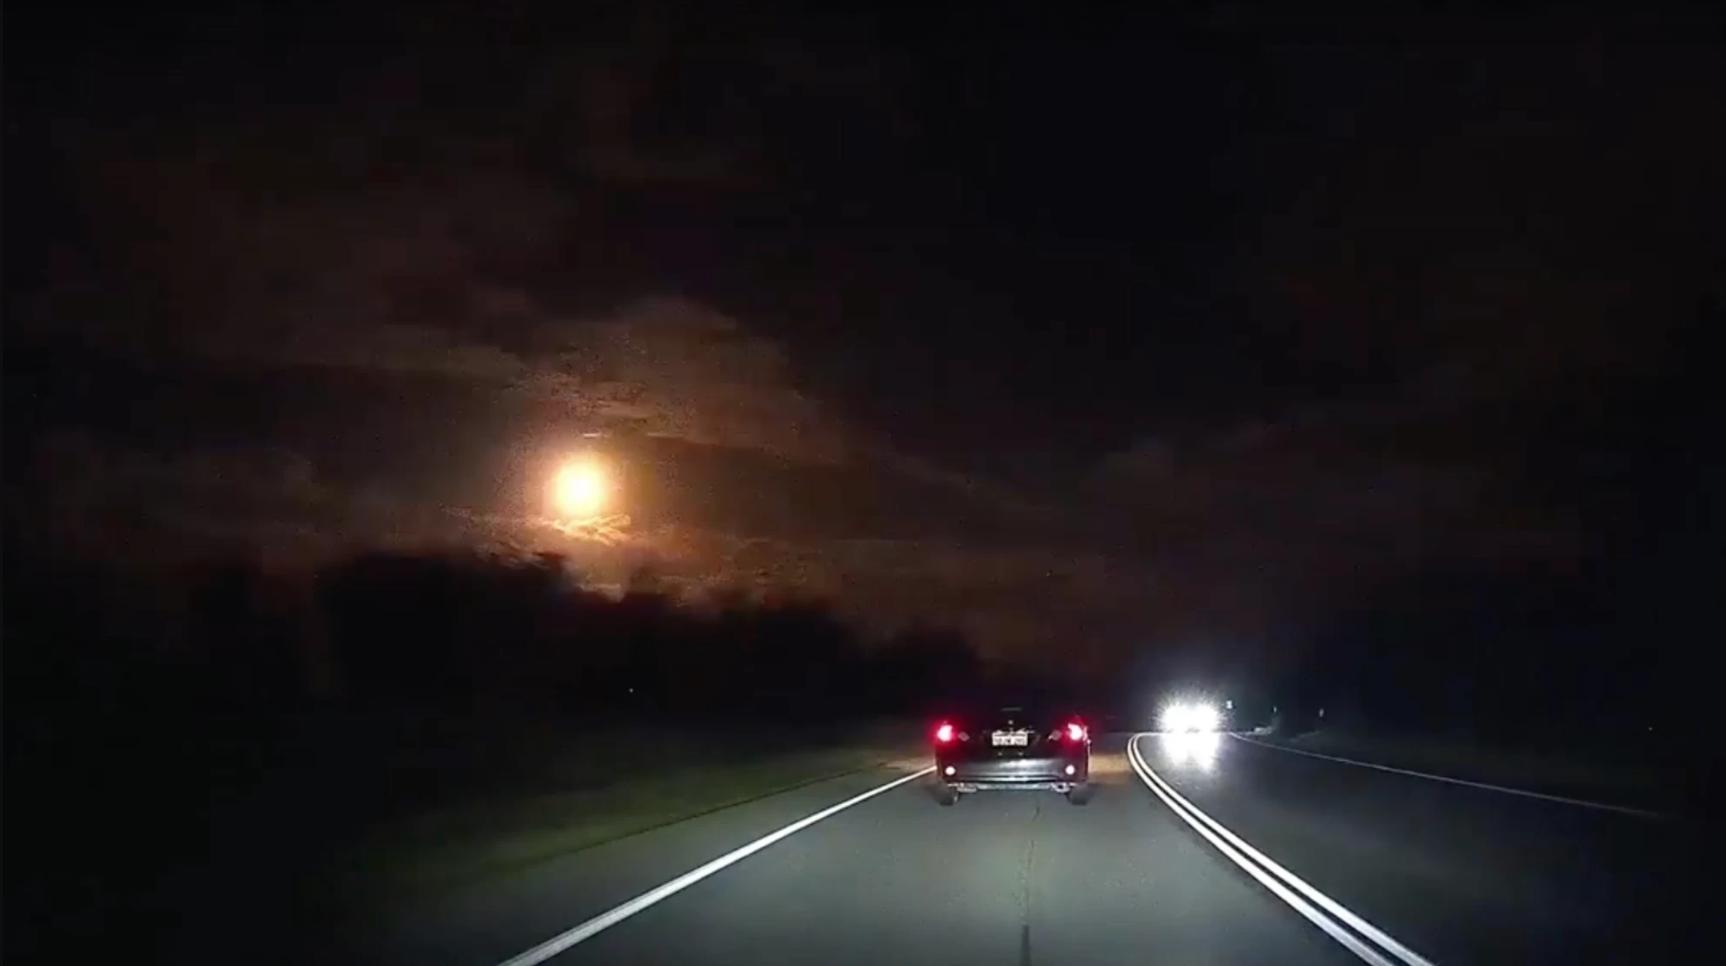 Над Австралией взорвался метеорит (видео)